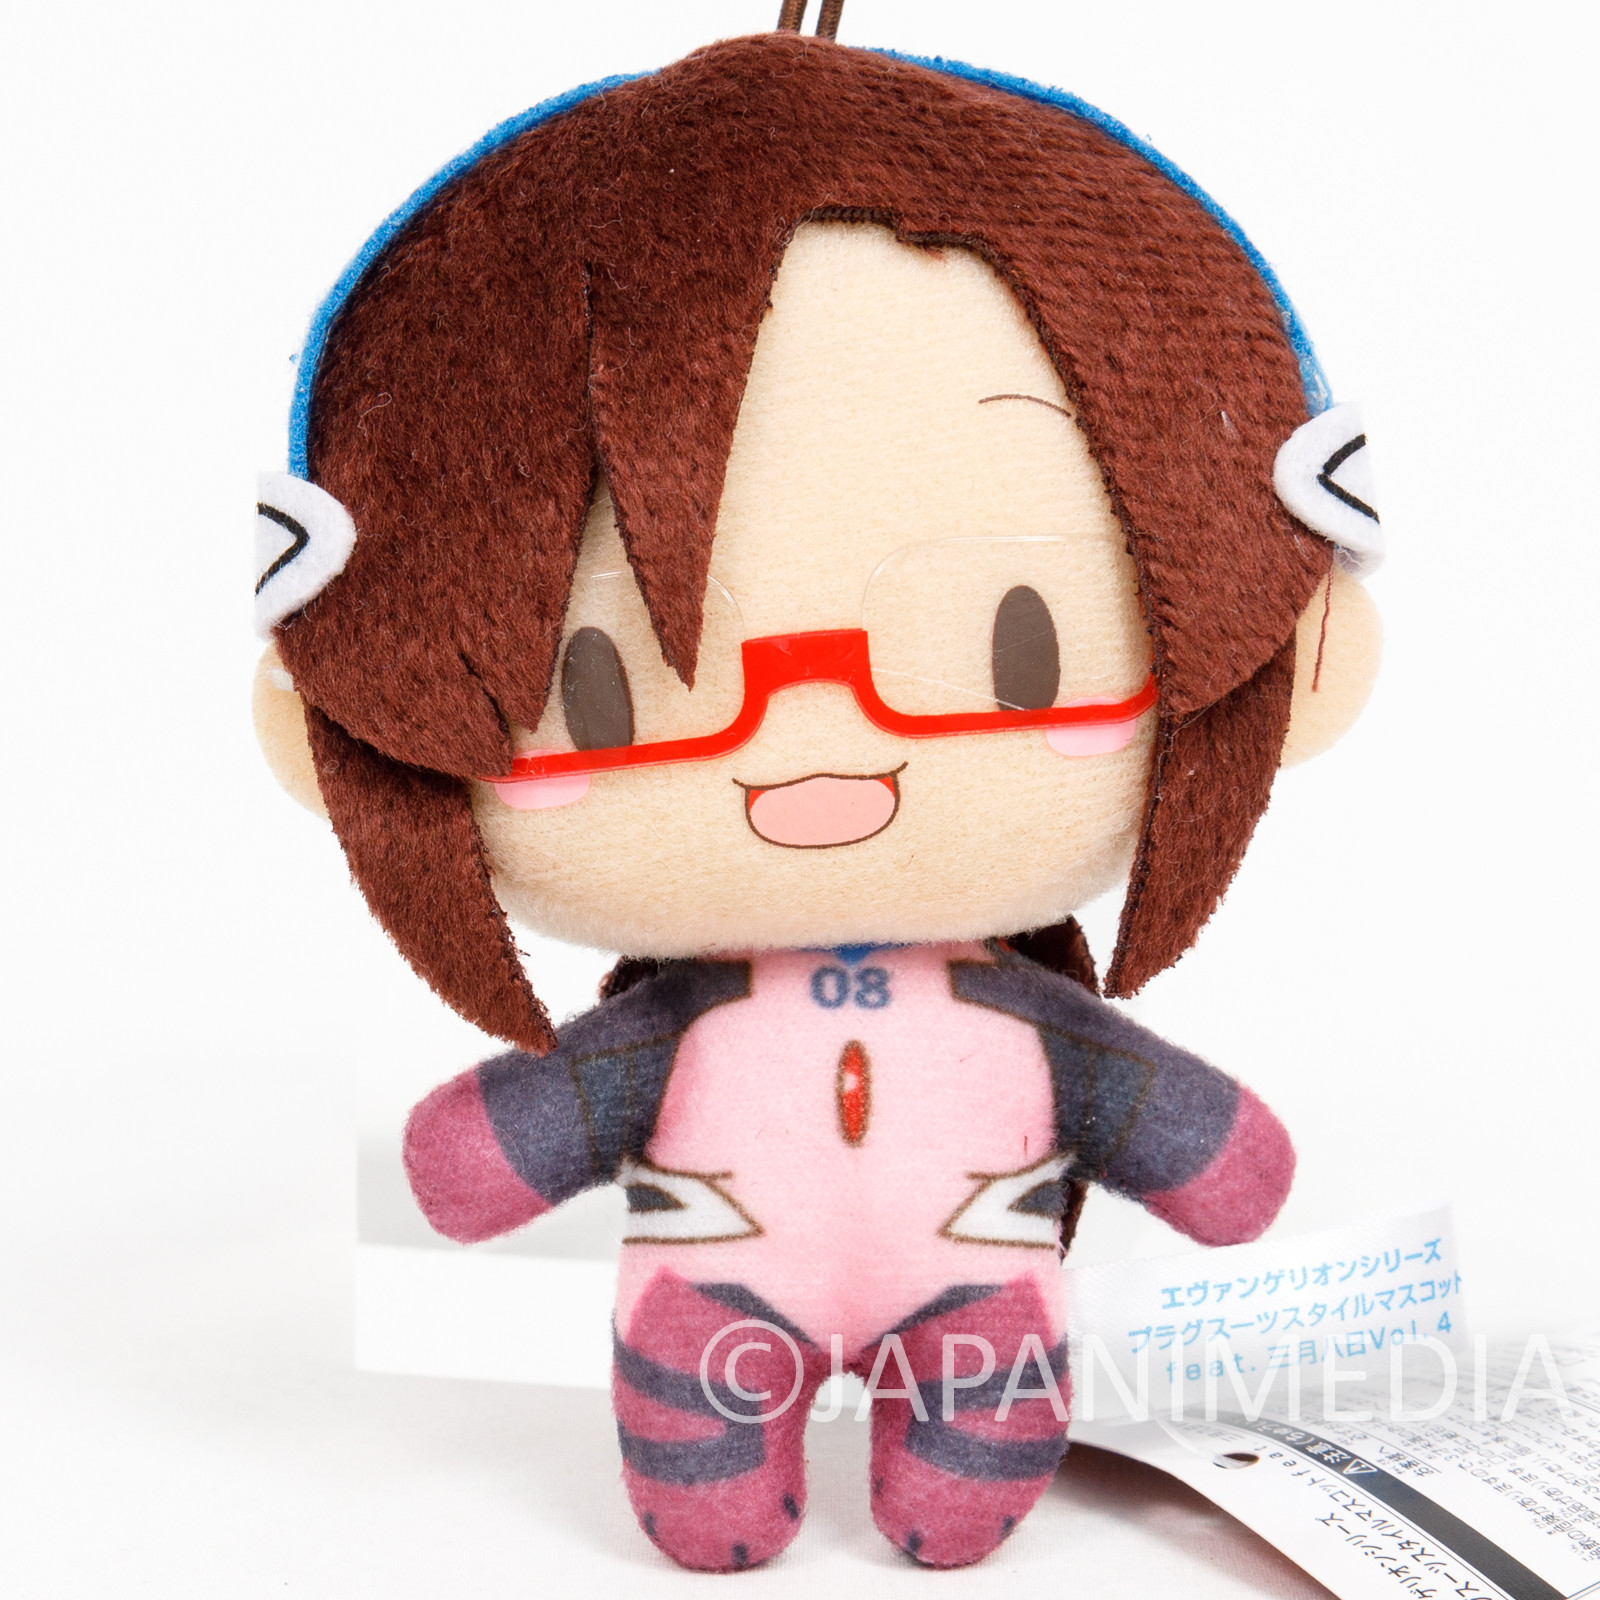 Evangelion Mari Illustrious Plugsuit Mini Plush Doll SEGA JAPAN ANIME MANGA 2